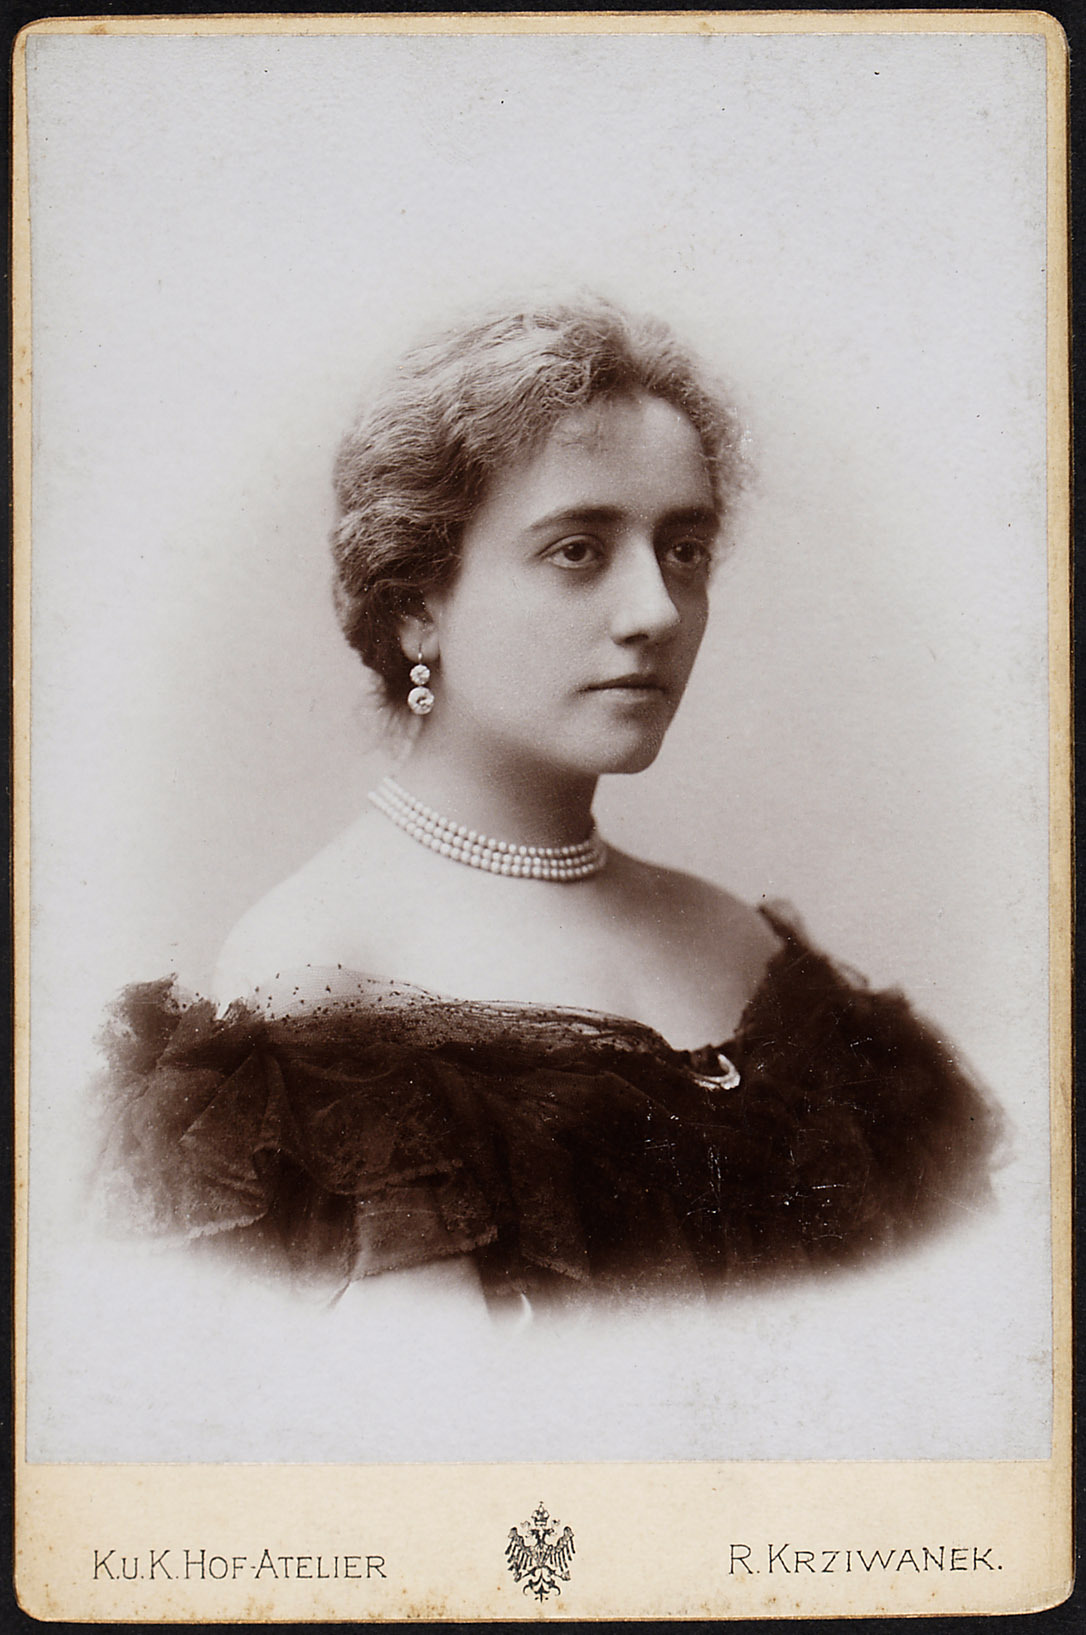 Irene Sironi von Atelier Rudolf Krziwanek, Wien